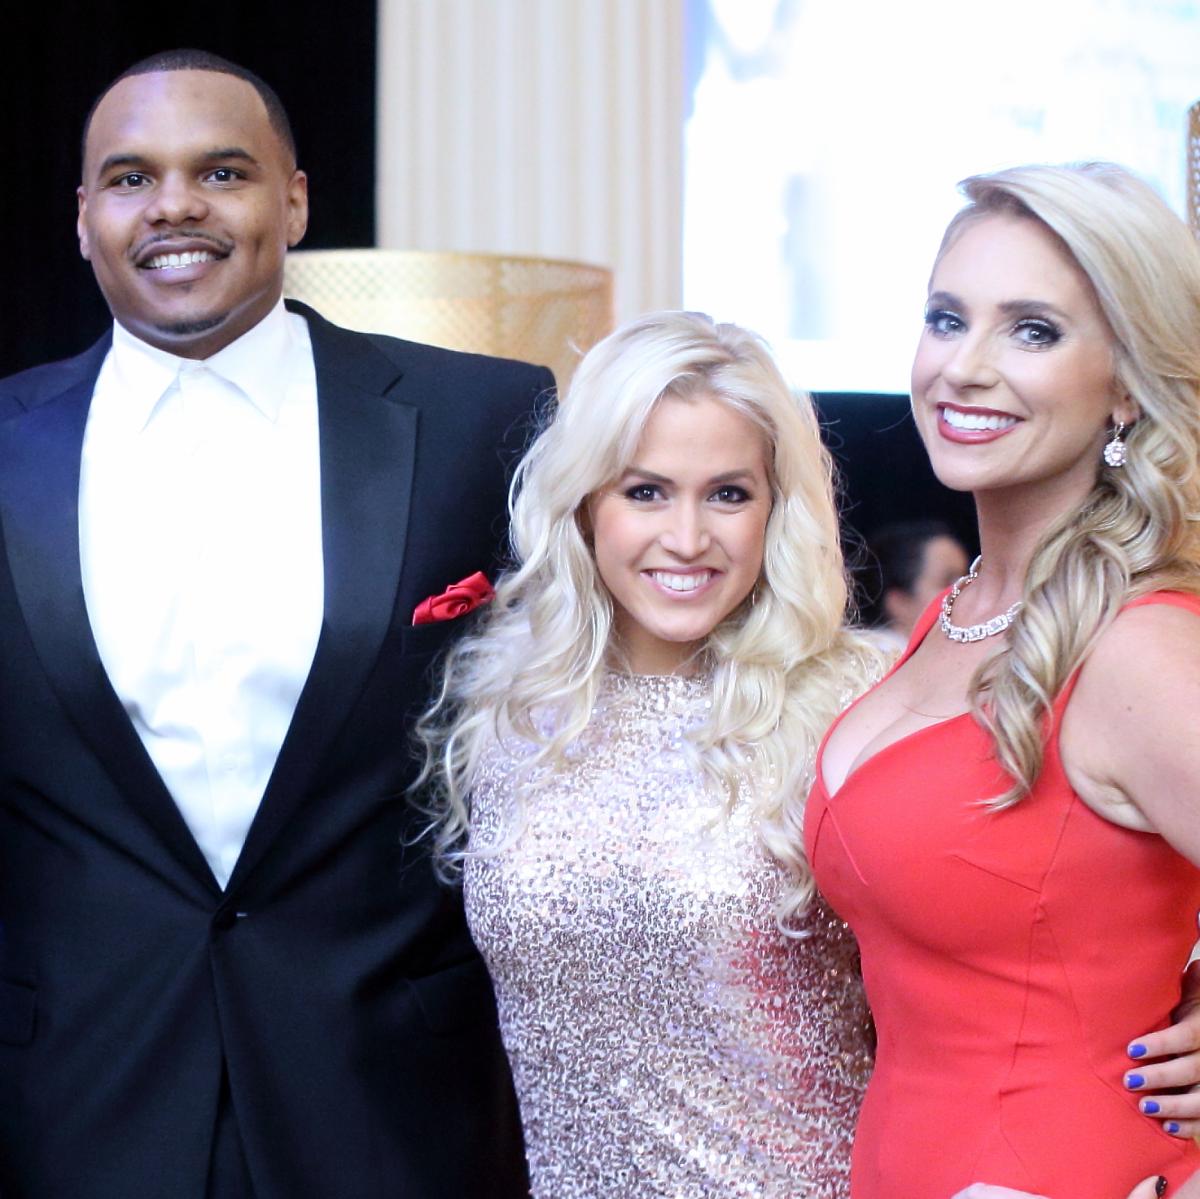 Houston, Jamies Hope Gala, October 2015, LaToya & Chester Pitts, Ericka Graham, Chita Johnson